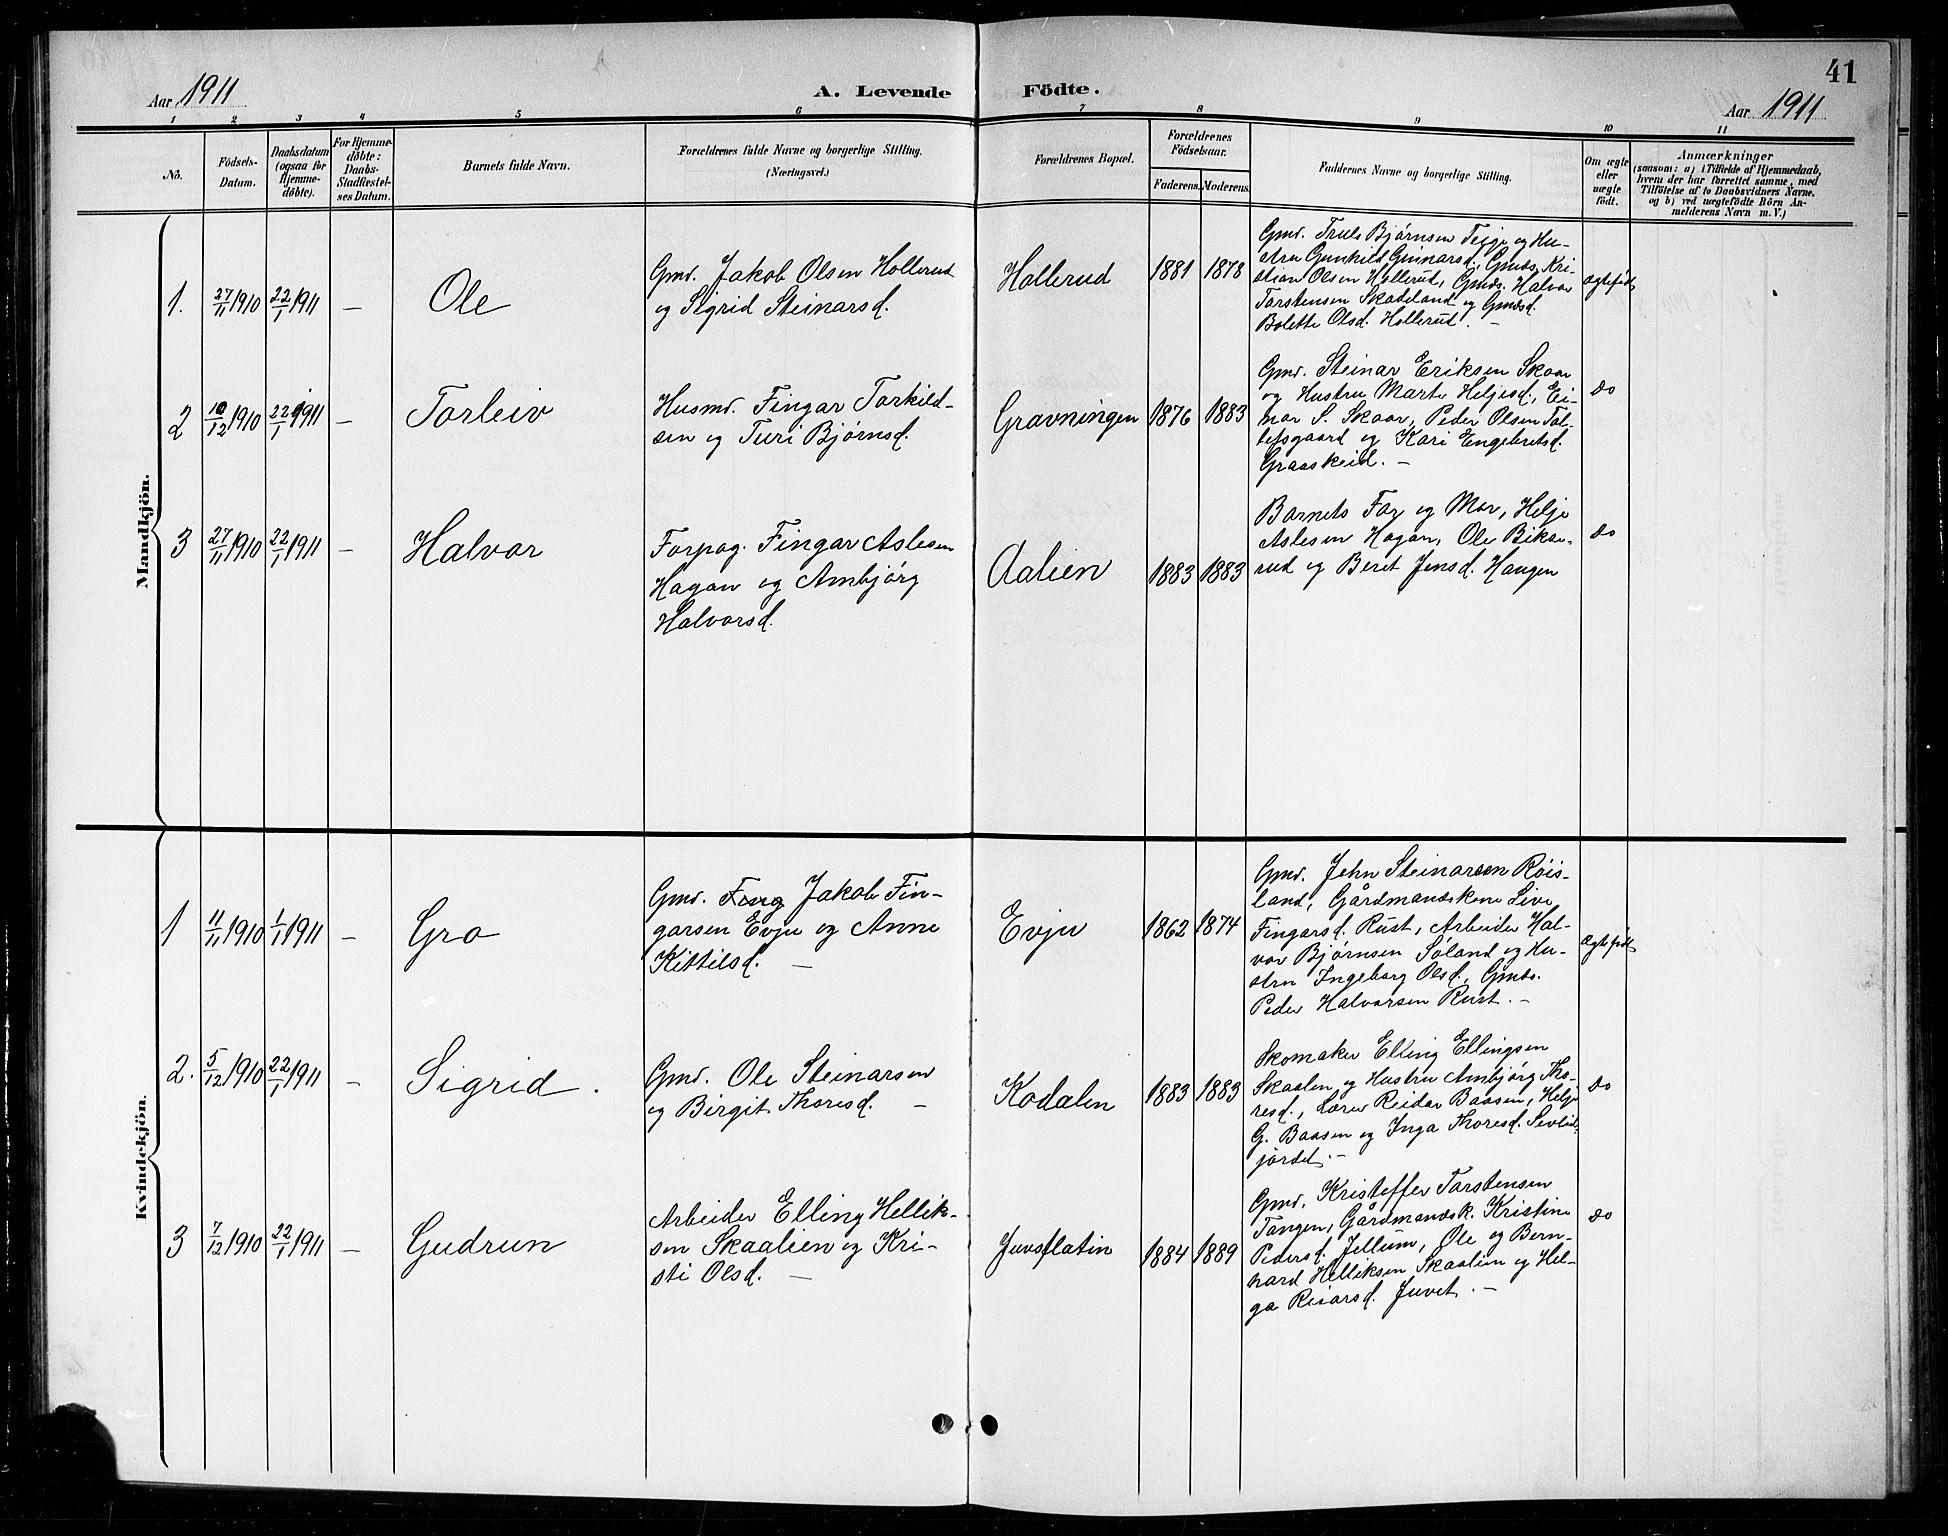 SAKO, Sigdal kirkebøker, G/Gb/L0003: Klokkerbok nr. II 3, 1901-1916, s. 41